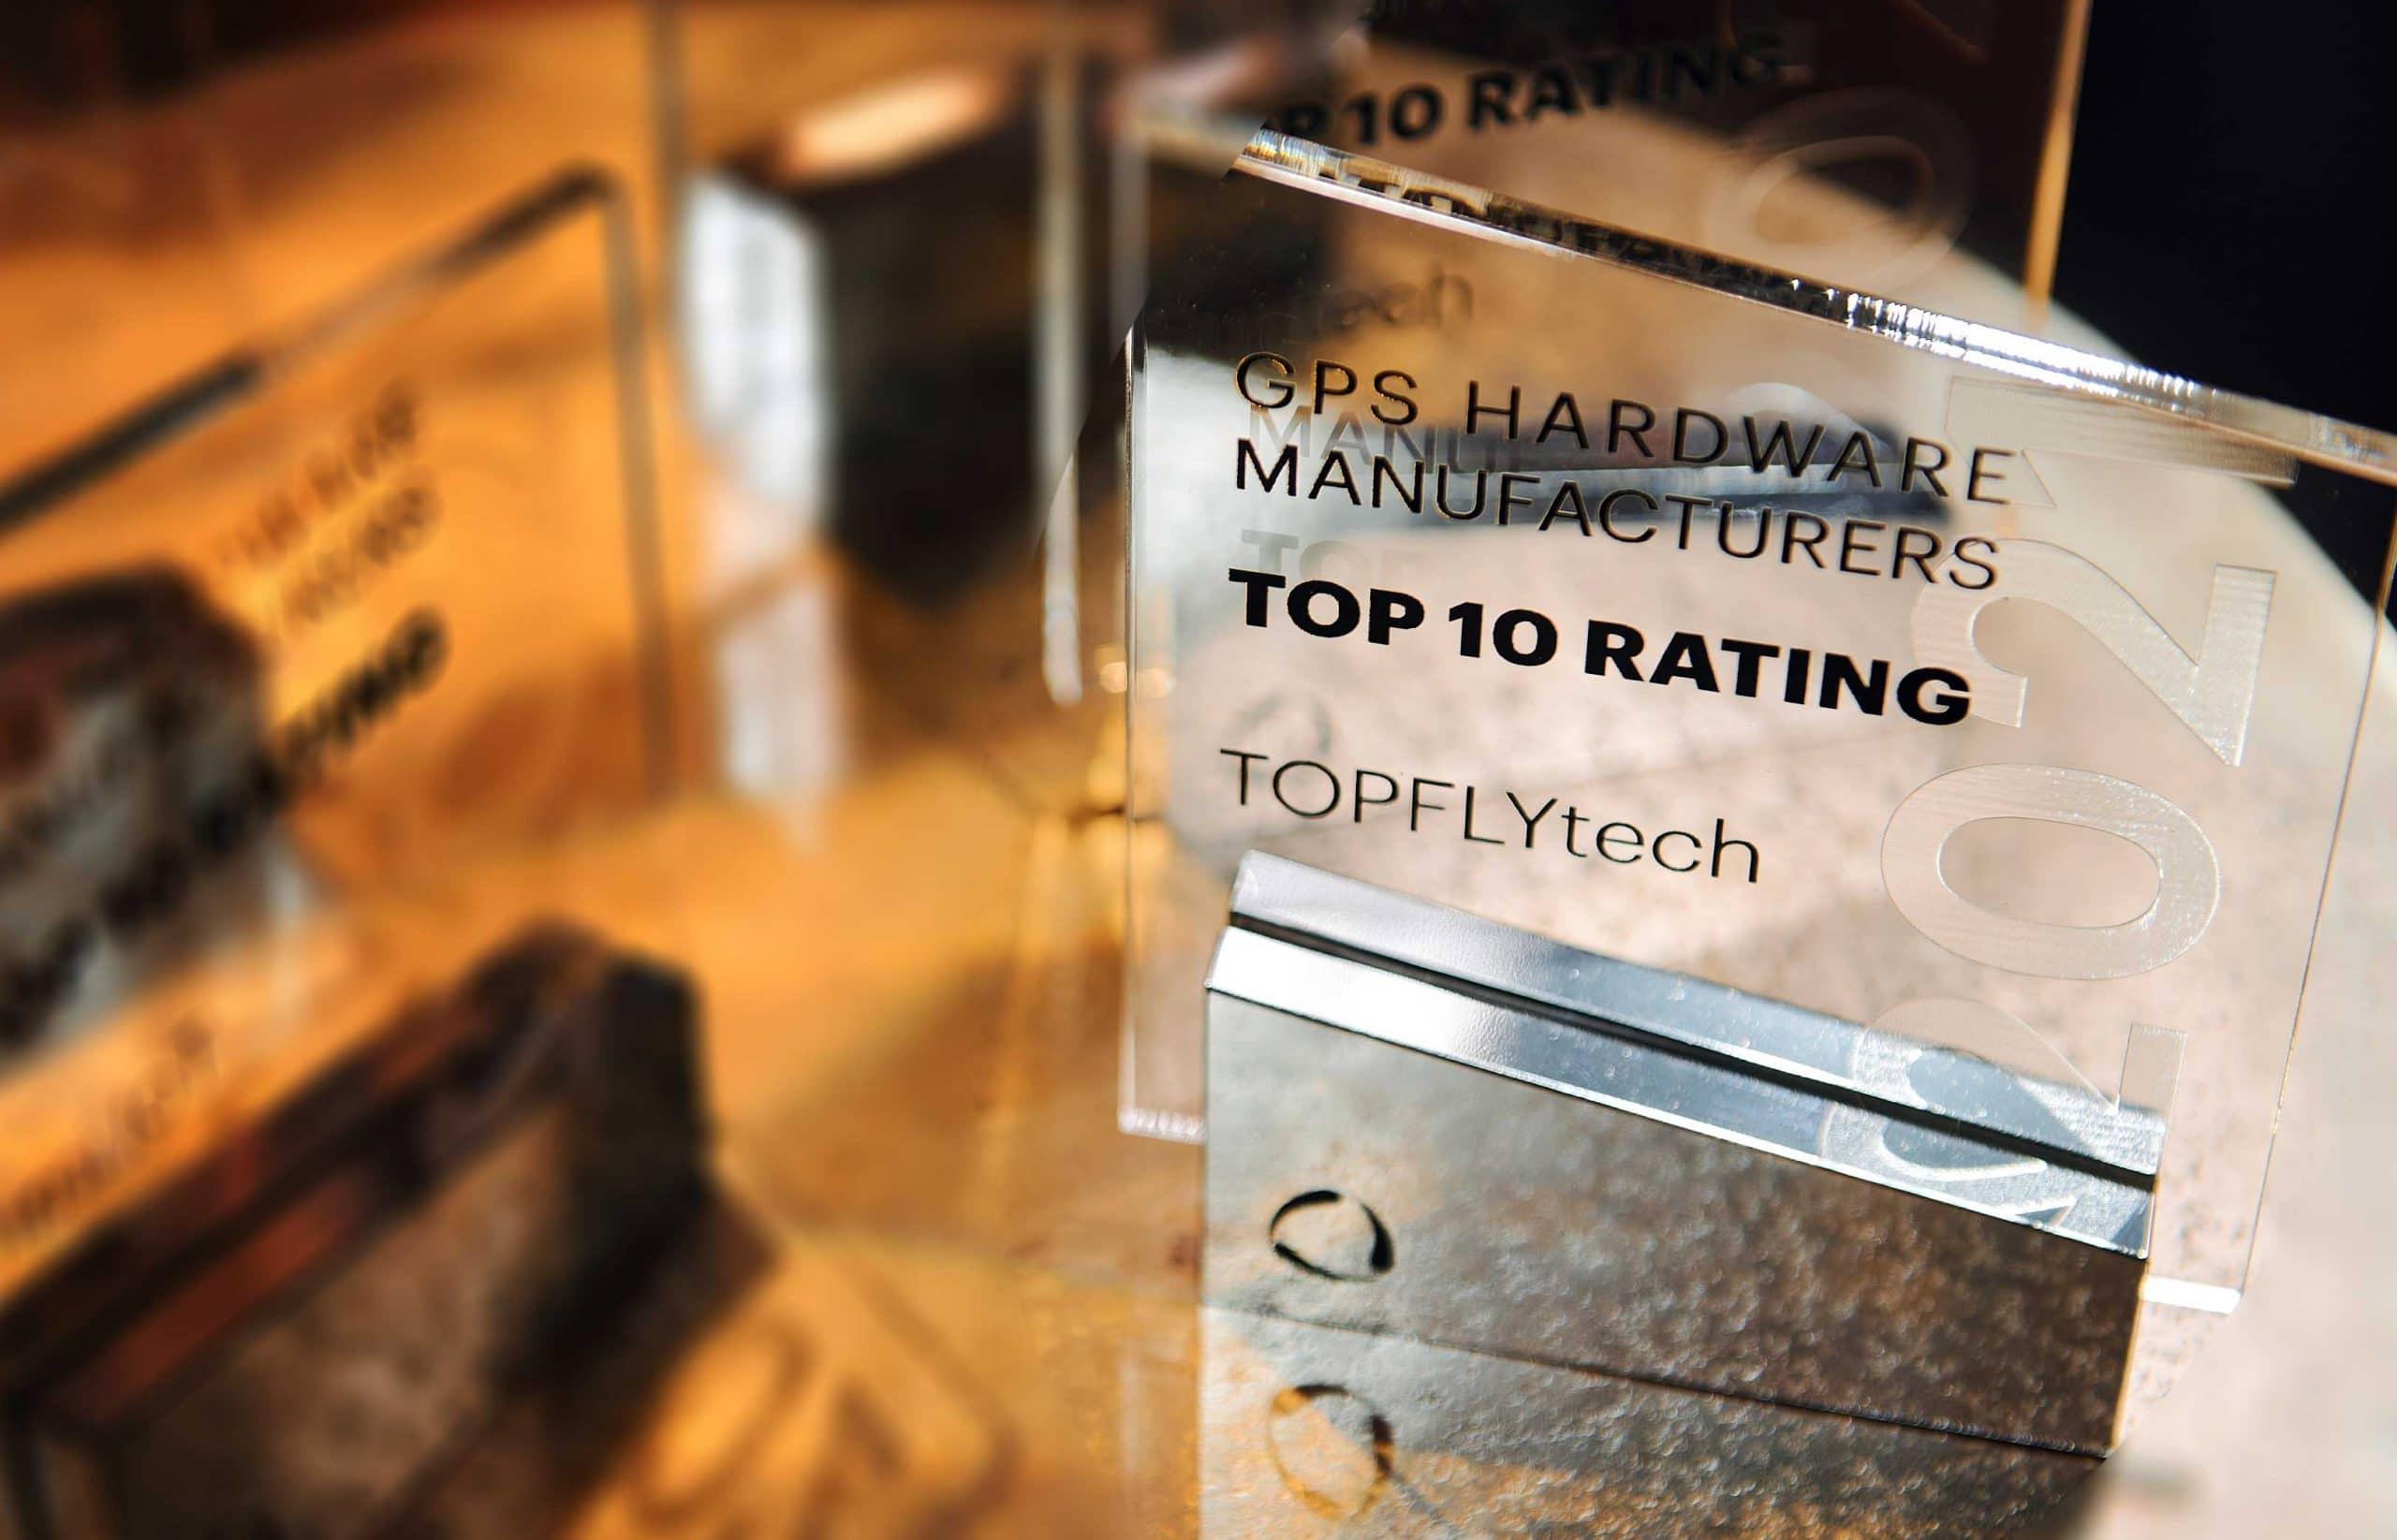 Wialon Top 10 GPS Hardware Manufacturers